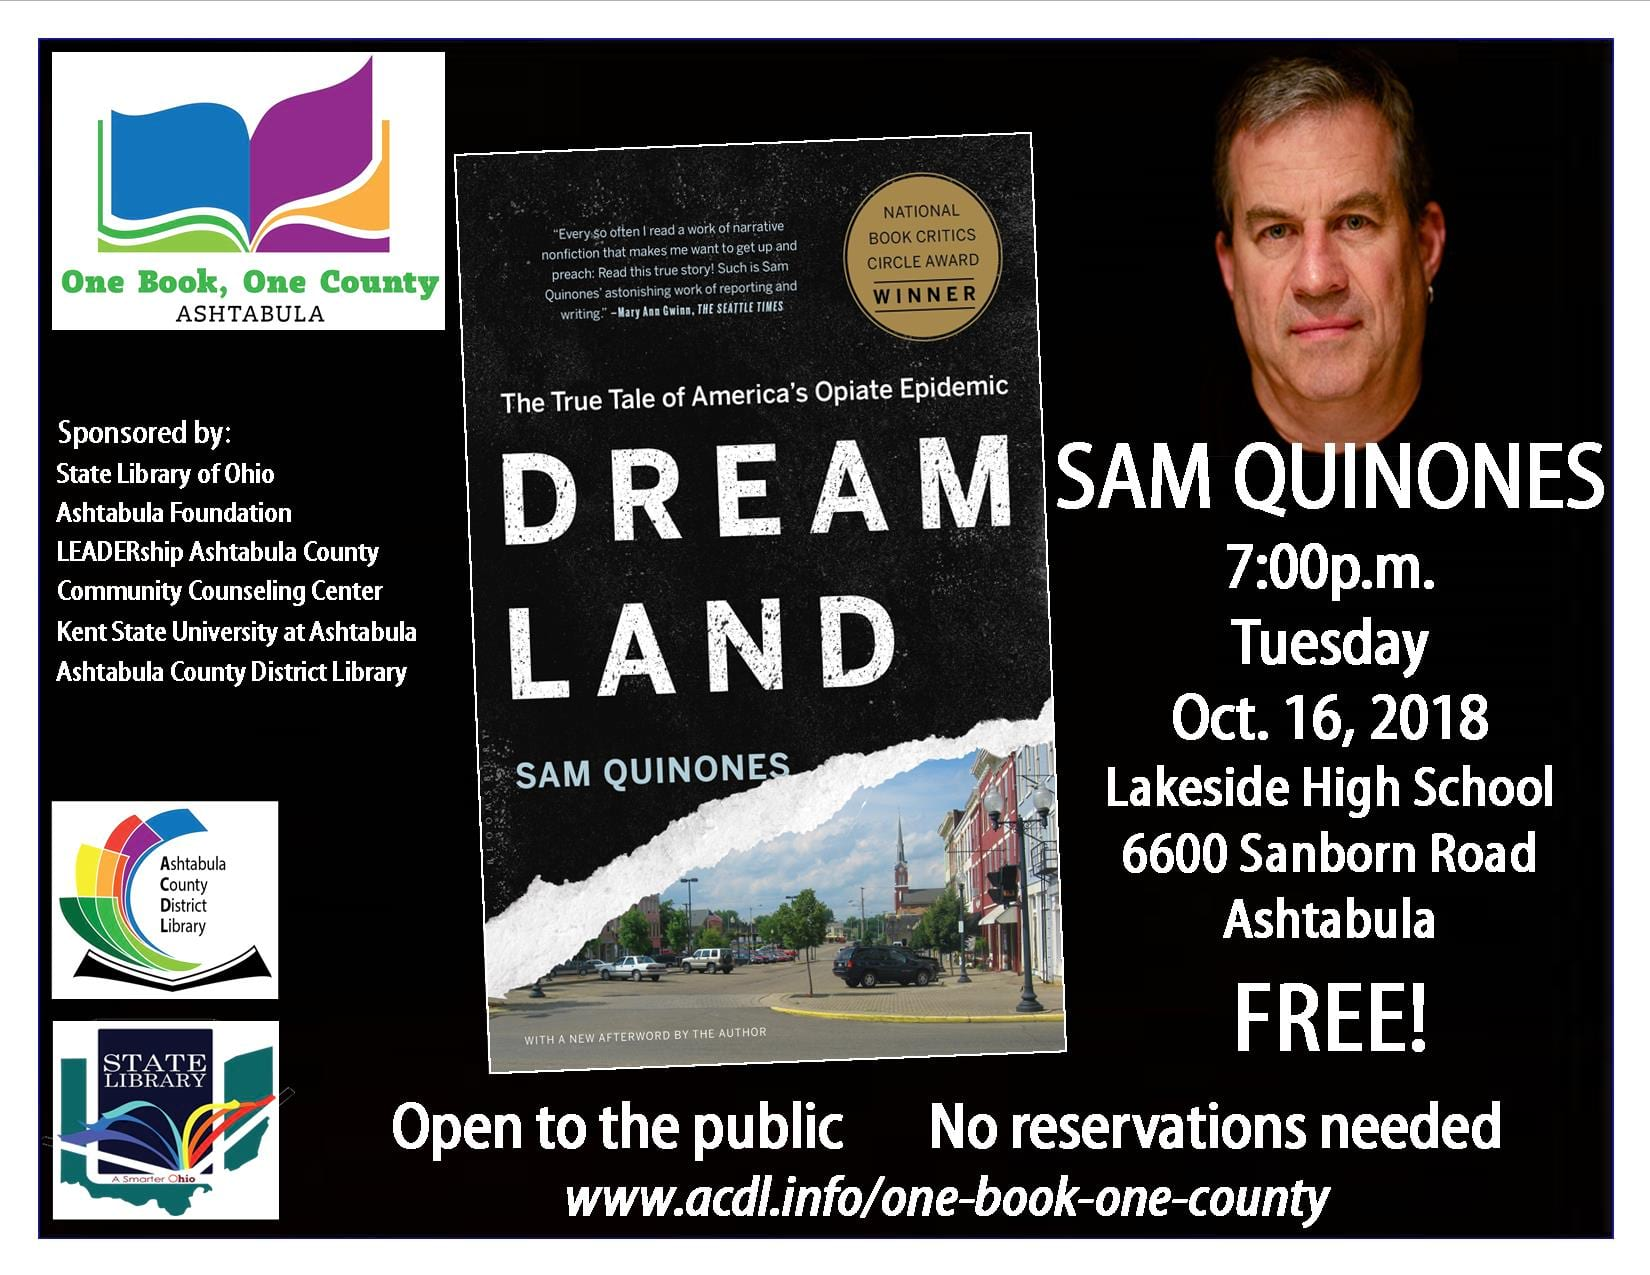 Dreamland Event flyer